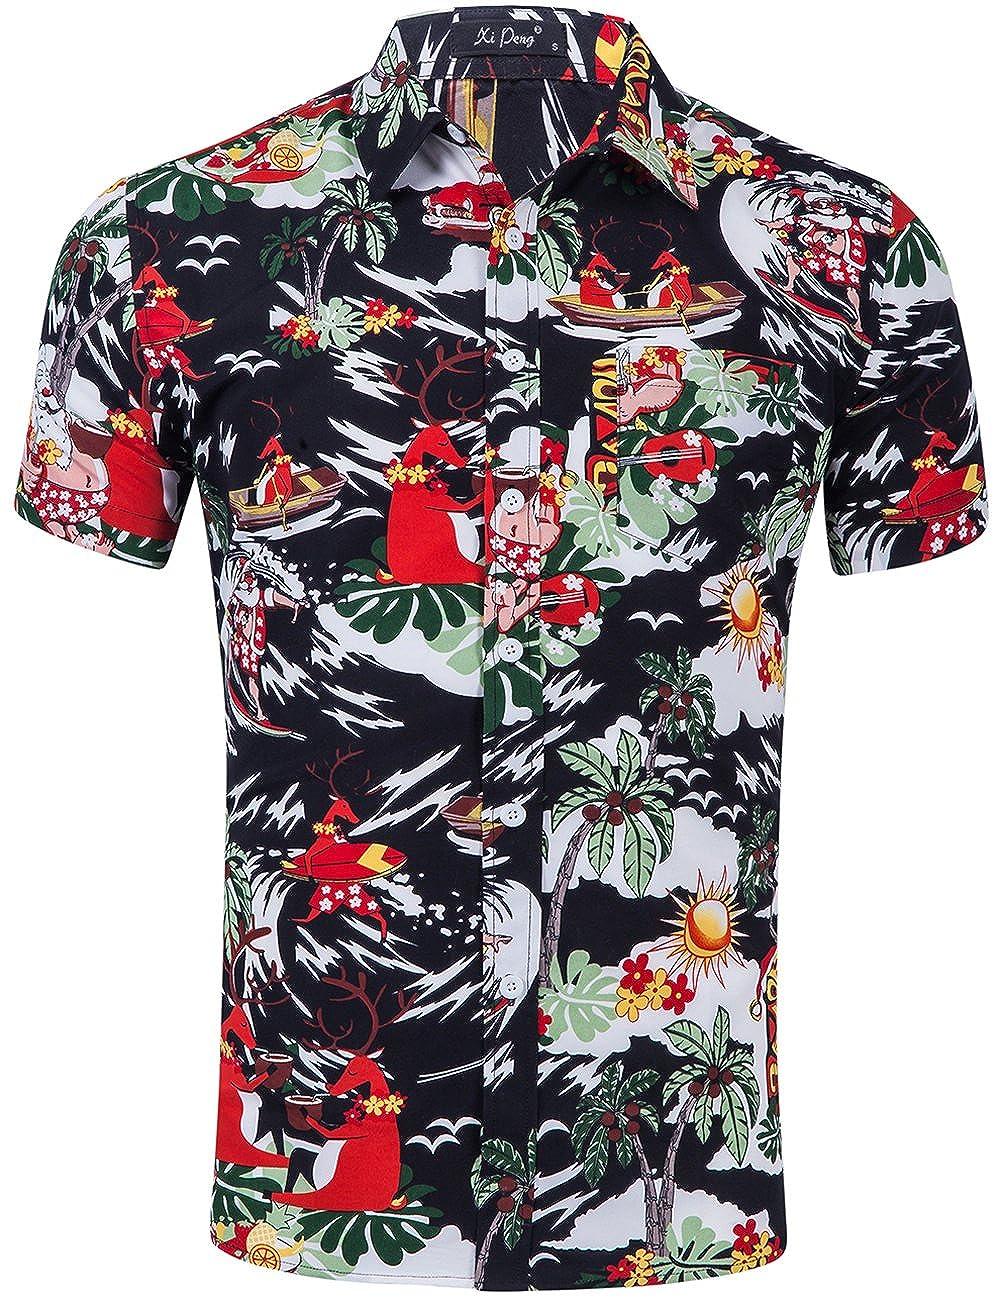 386d88ae DESIGN:Summer Tropical Men\'s Casual Button Up Flamingo Hibiscus Christmas  Caribbean Attire Beach Aloha Hawaiian Shirts(Floral Hibiscus/Flamingo/Coconut  ...